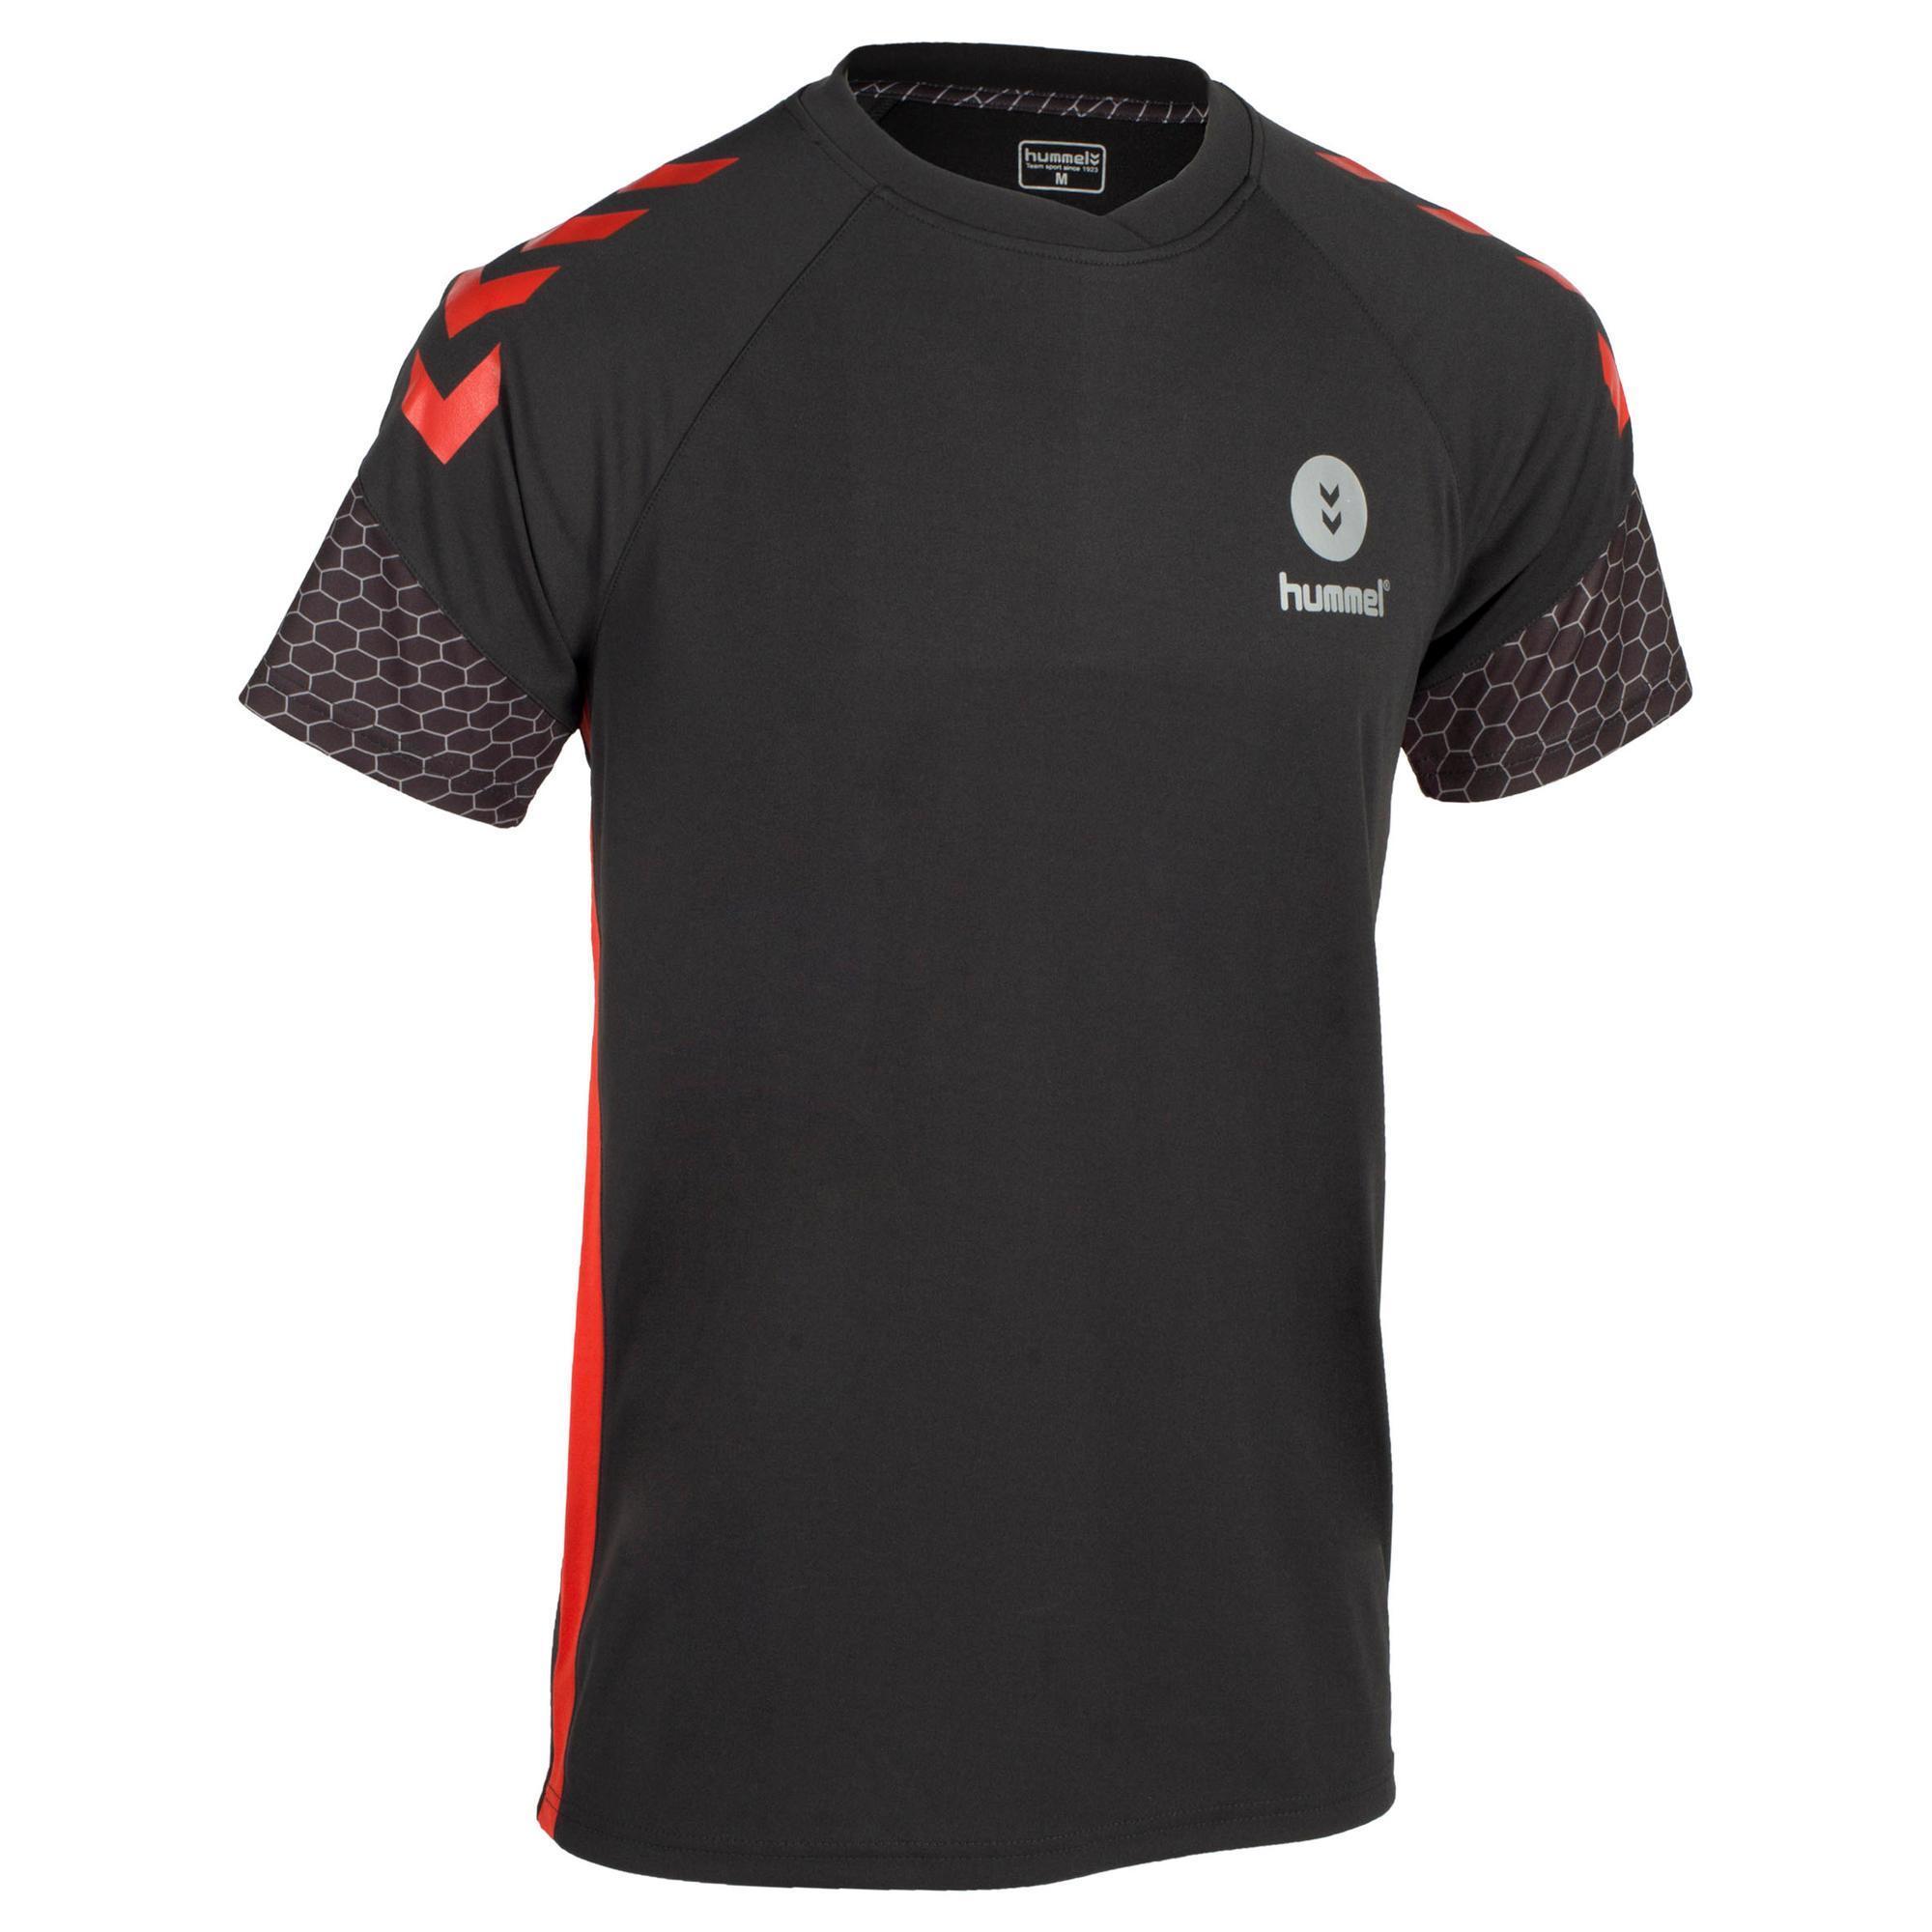 Handballtrikot Herren grau/rot | Sportbekleidung > Trikots > Handballtrikots | Schwarz - Rot | Hummel